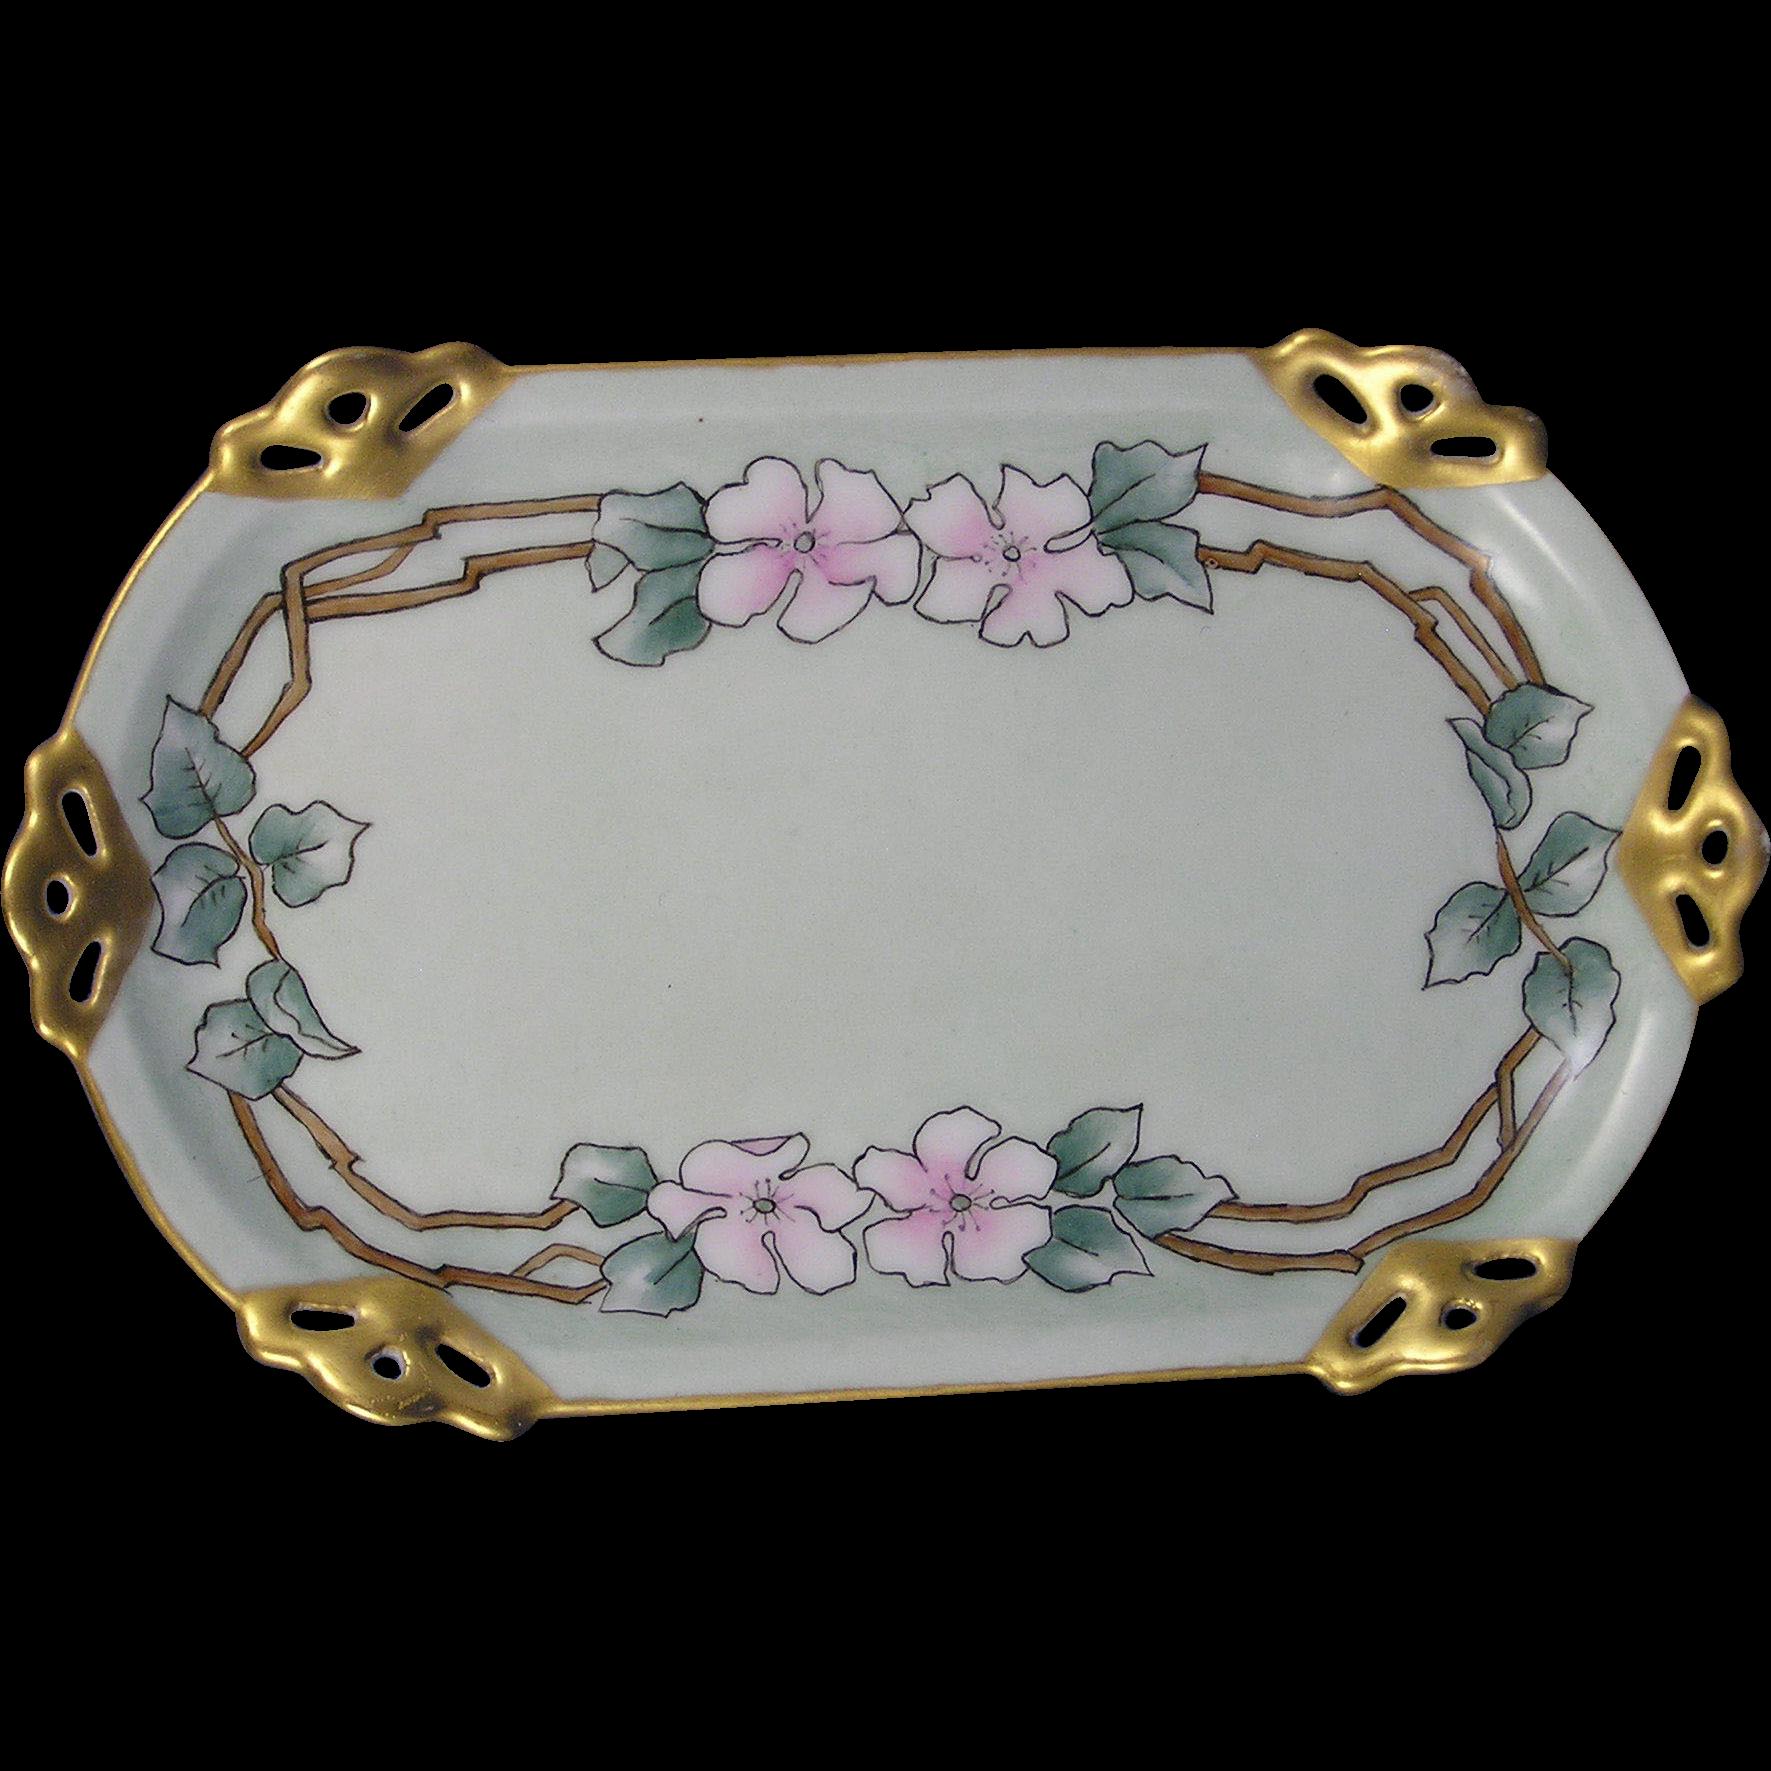 Moritz Zdekauer (MZ) Austria Arts & Crafts Floral Motif Pin Dish/Tray (c.1884-1909)